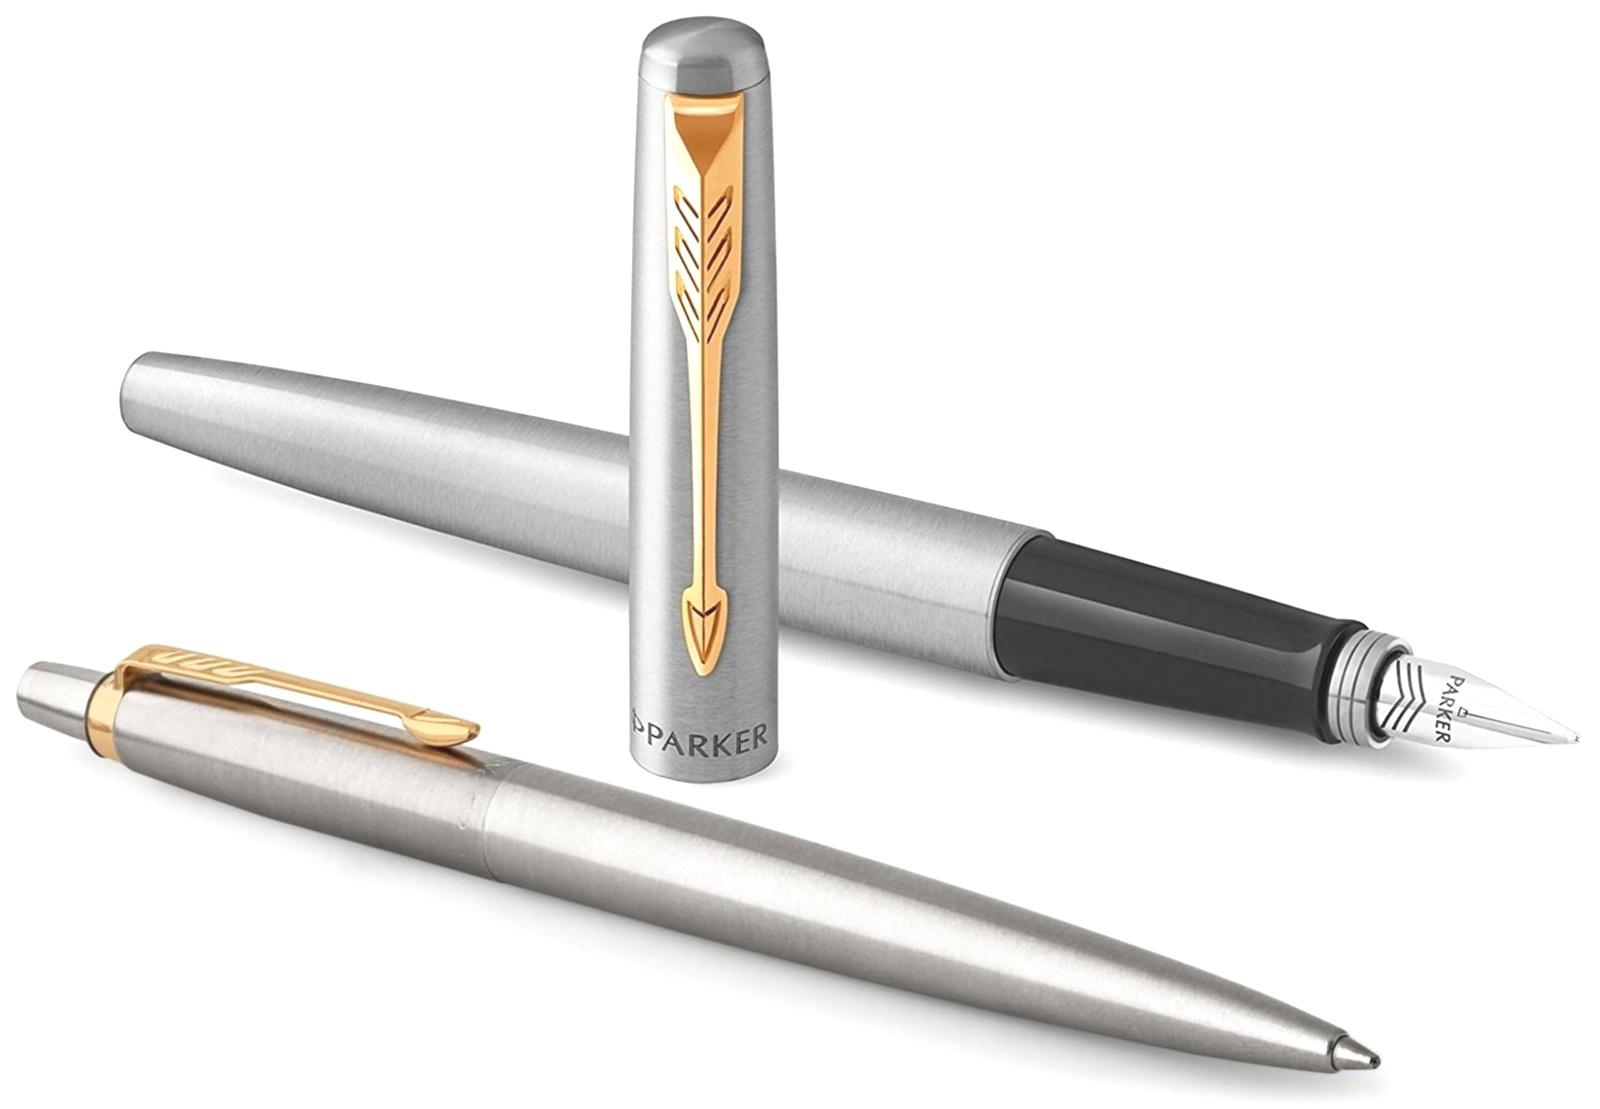 FK691 (2093257) Набор Parker Jotter Core Streel GT ручка перьевая, ручка шариковая